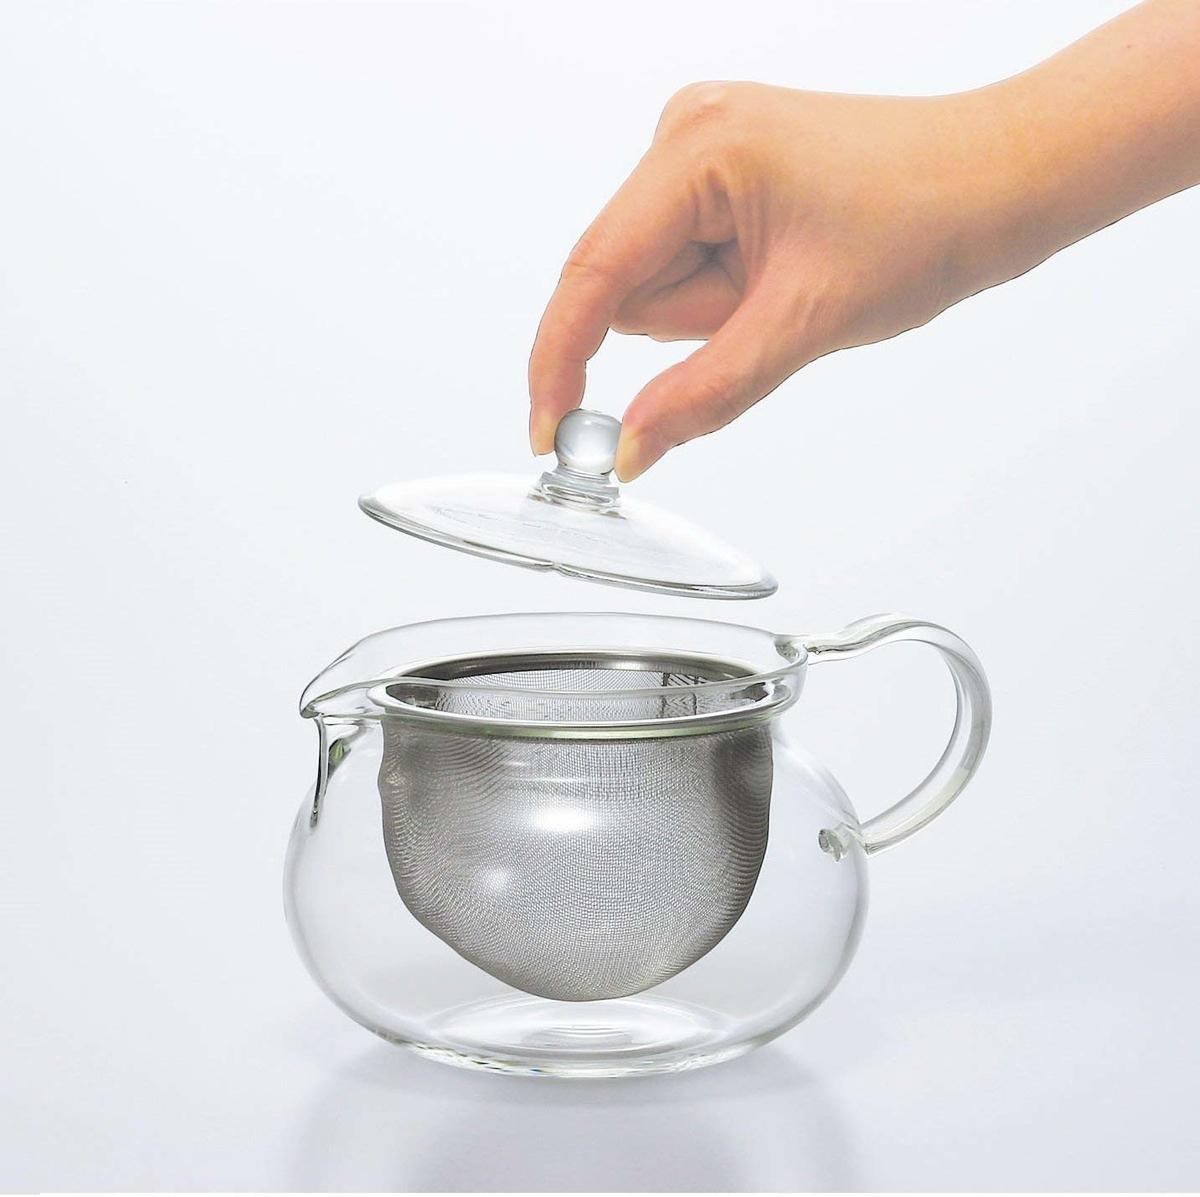 HARIO (ハリオ) 茶茶 急須 丸 700ml CHJMN-70T